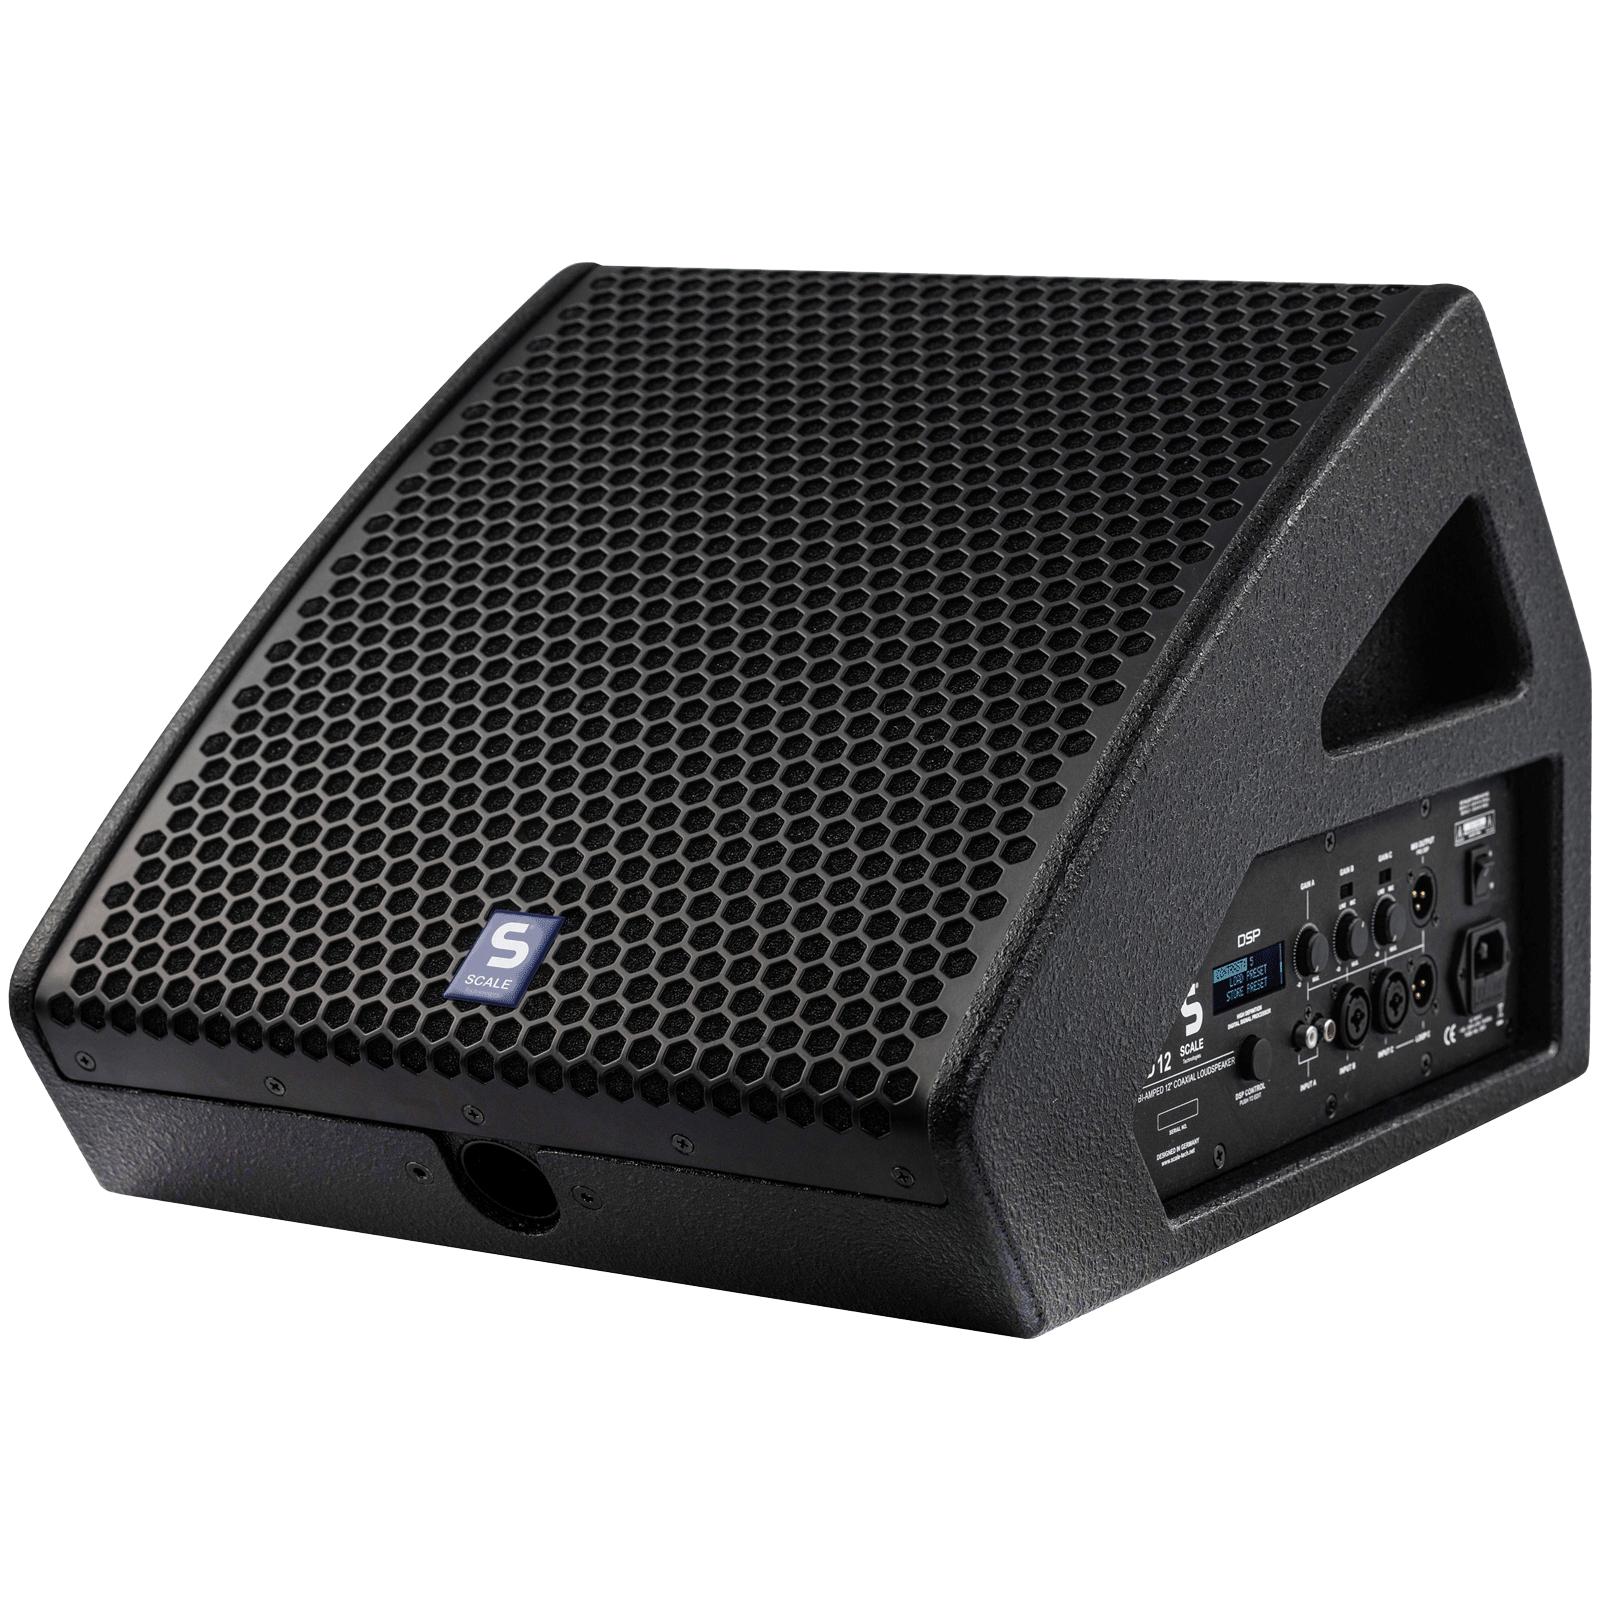 CD12 ScaleNordic Distributor of Pro Audio equipment